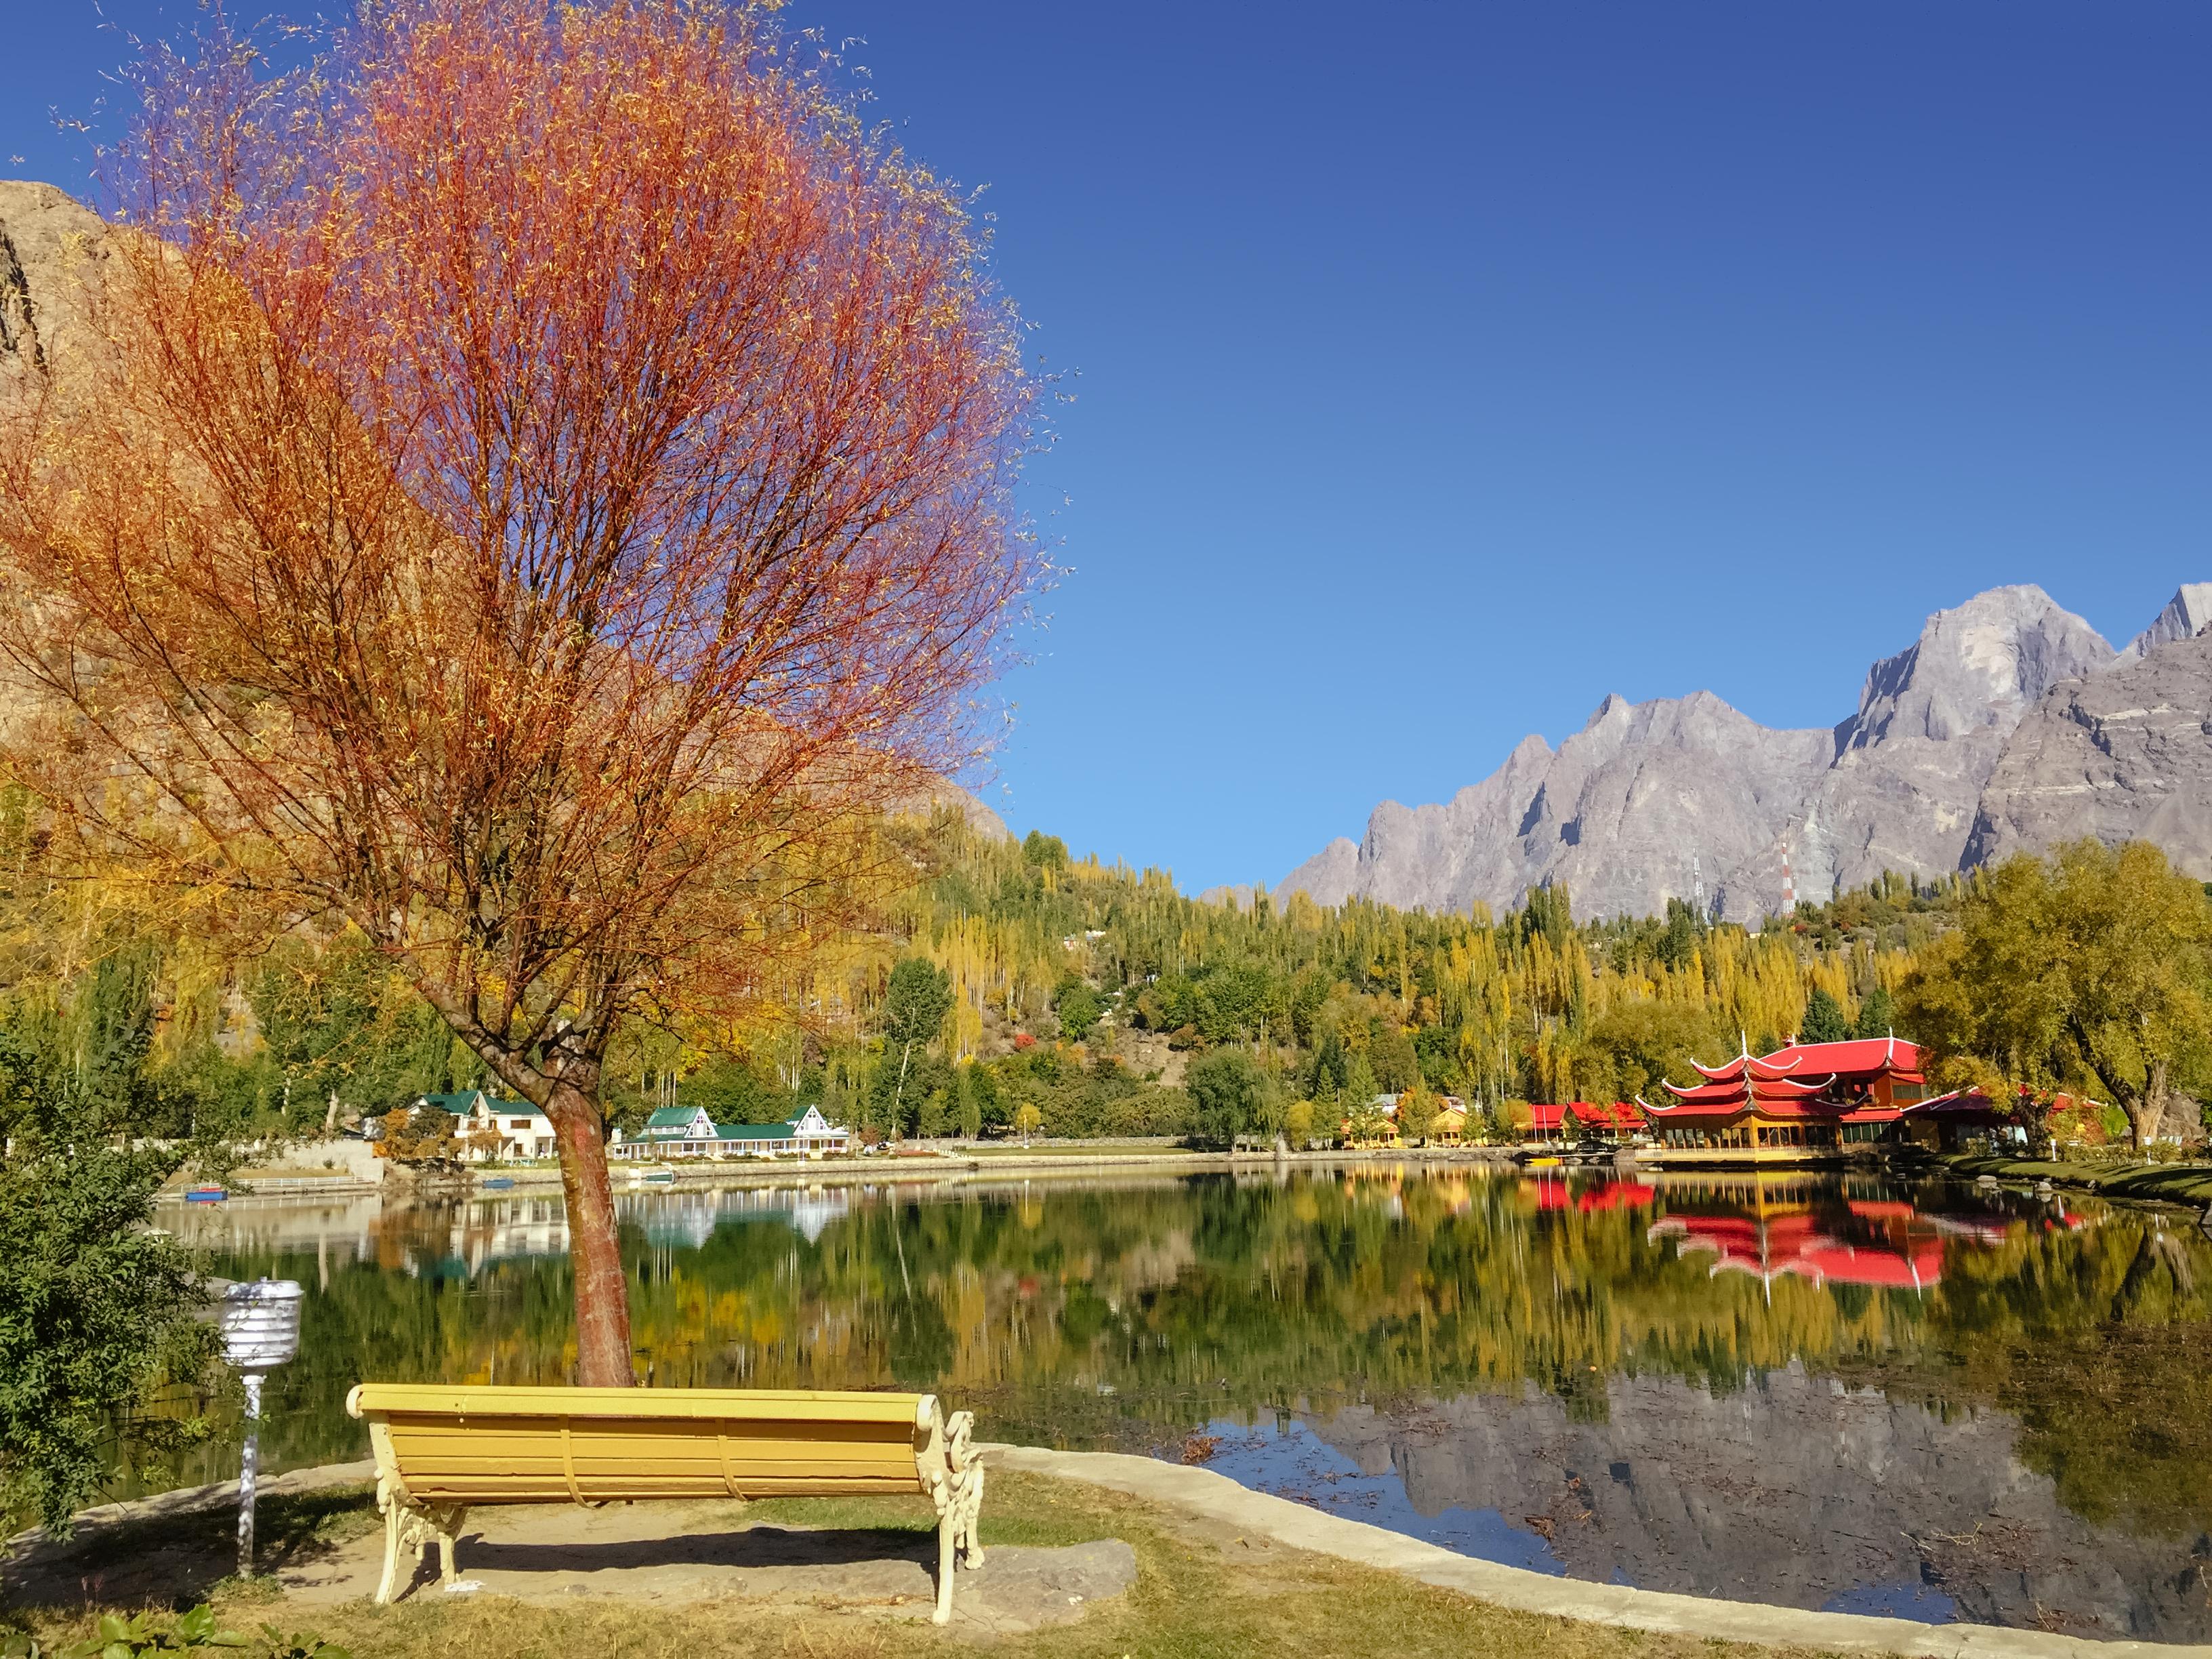 Follaje colorido en otoño en el lago Kachura, Pakistán